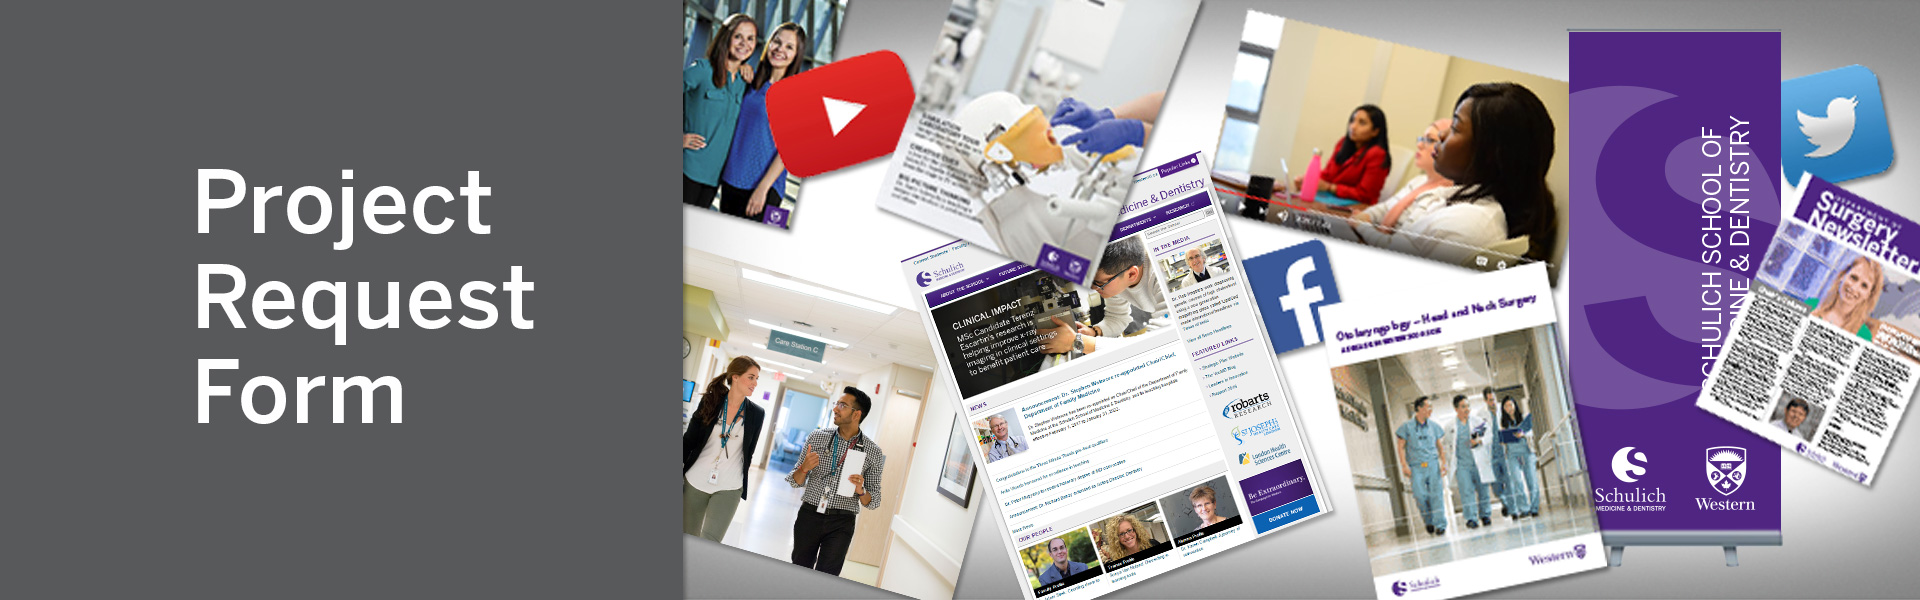 Schulich School of Medicine & Dentistry - Western University